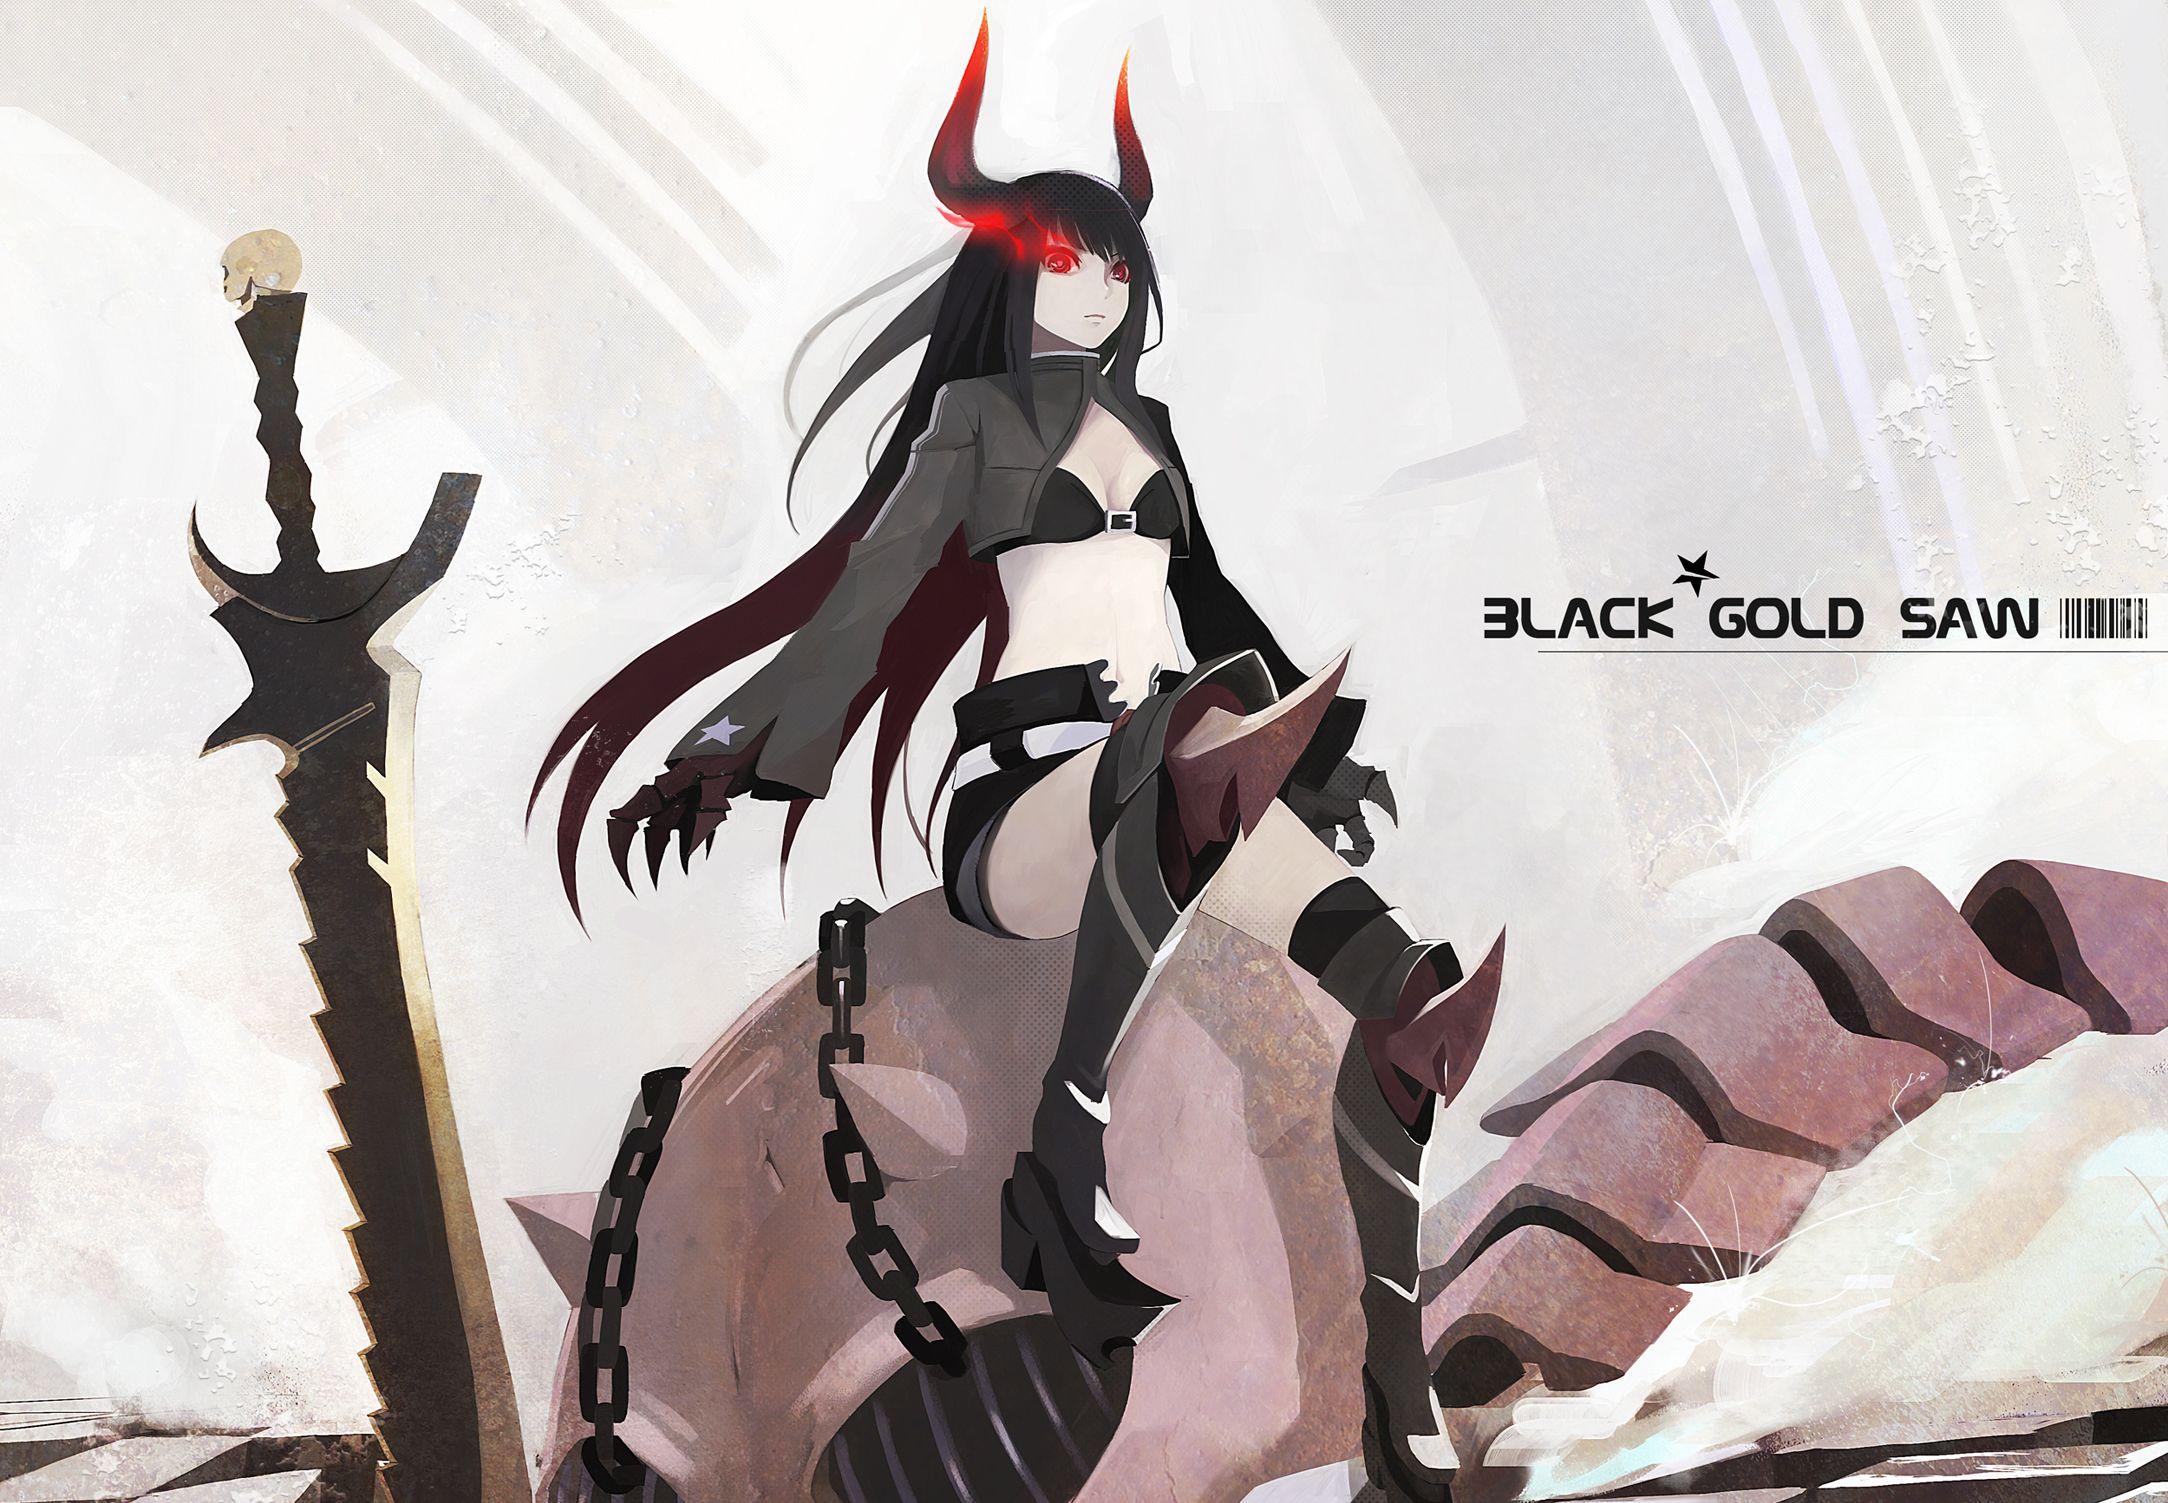 Anime Black Rock Shooter Black Gold Saw Wallpaper